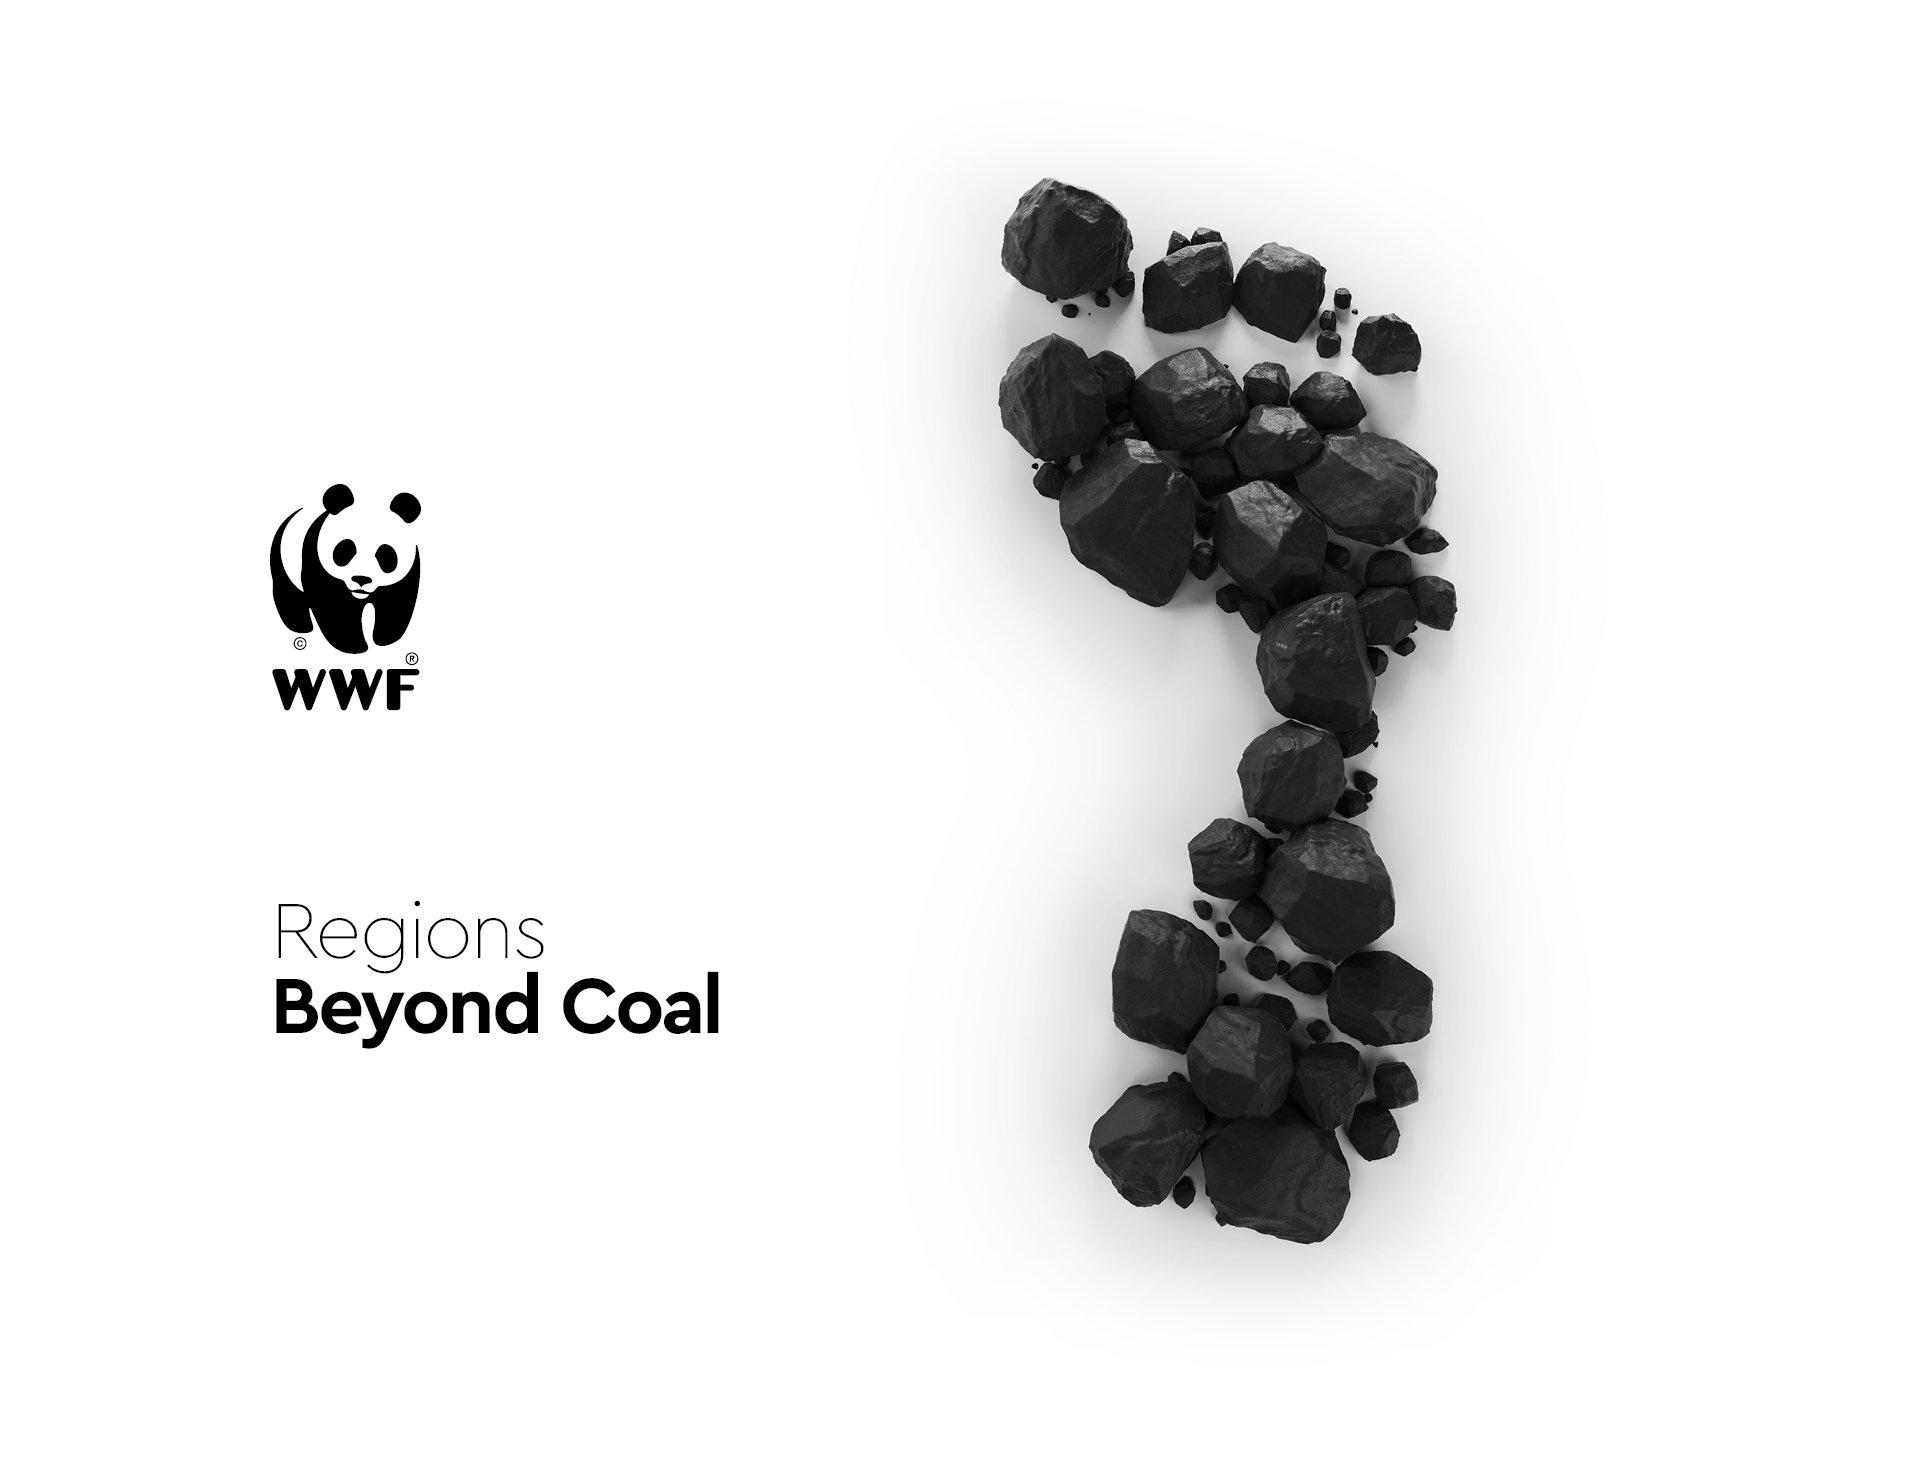 WWF just transition